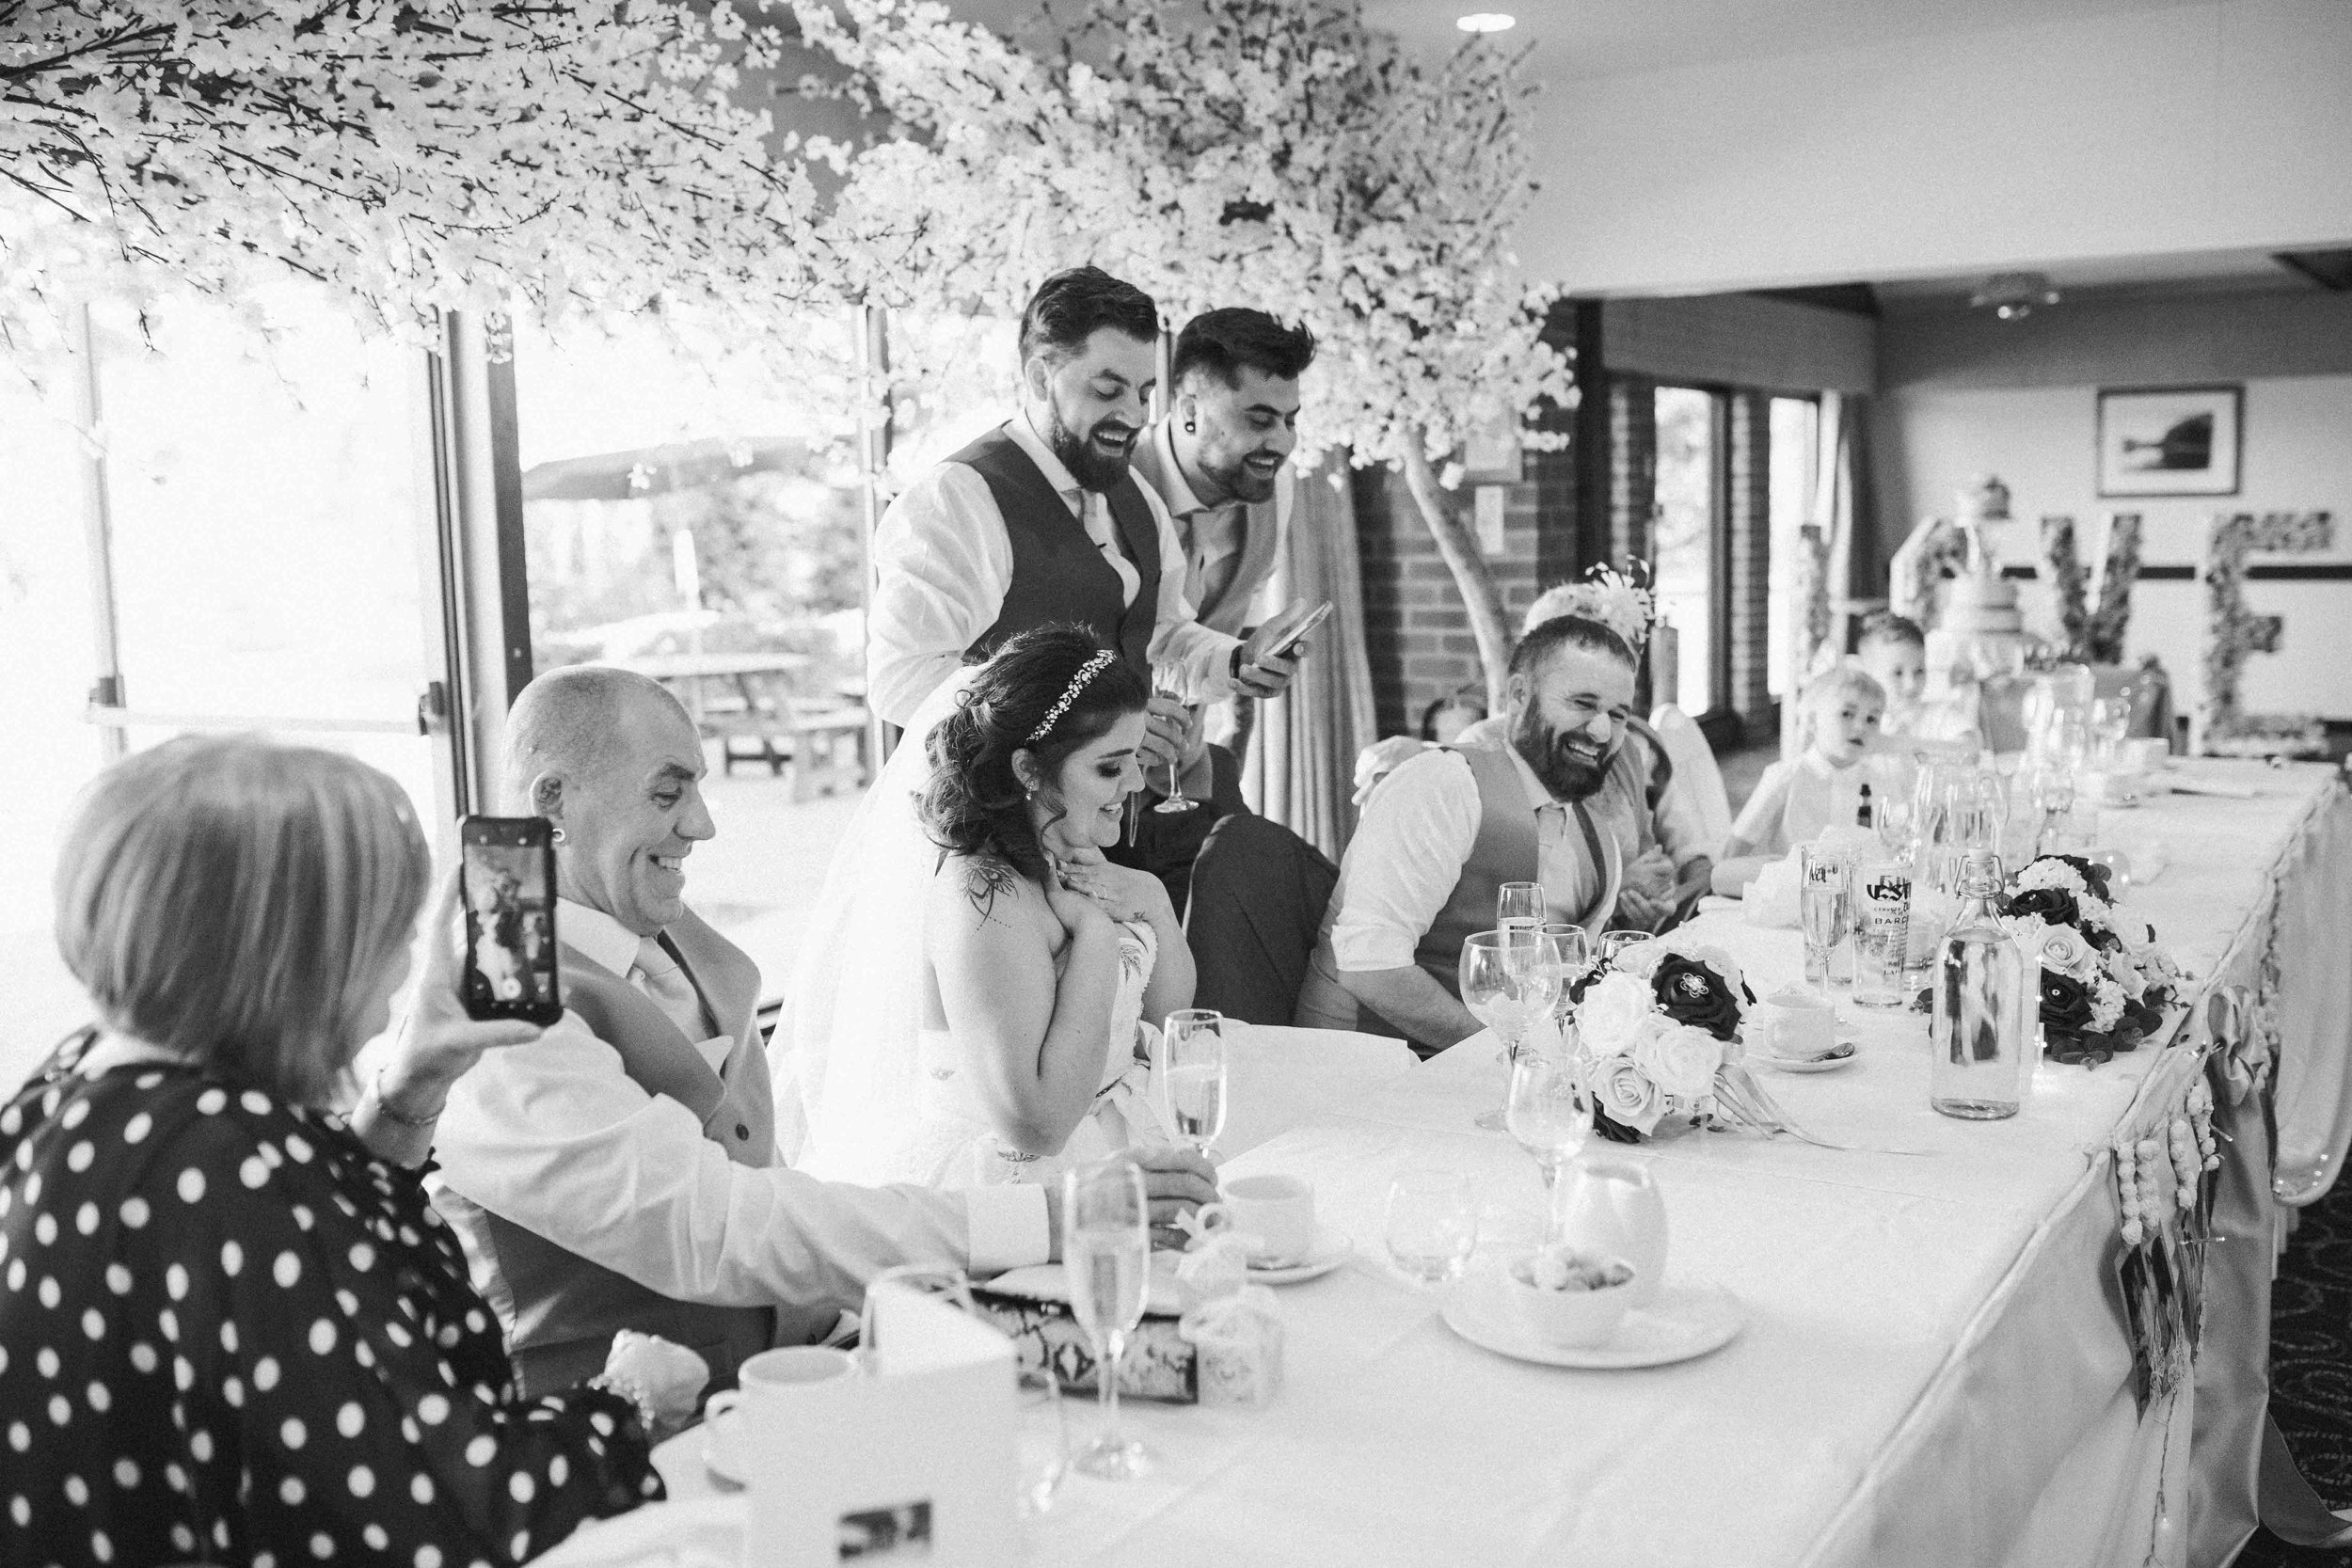 Lea-cooper-photography-wedding-photography-wolverhampton-patshull-park-hotel-wedding-pattingham-wolverhampton-west-midlands-uk-9.JPG